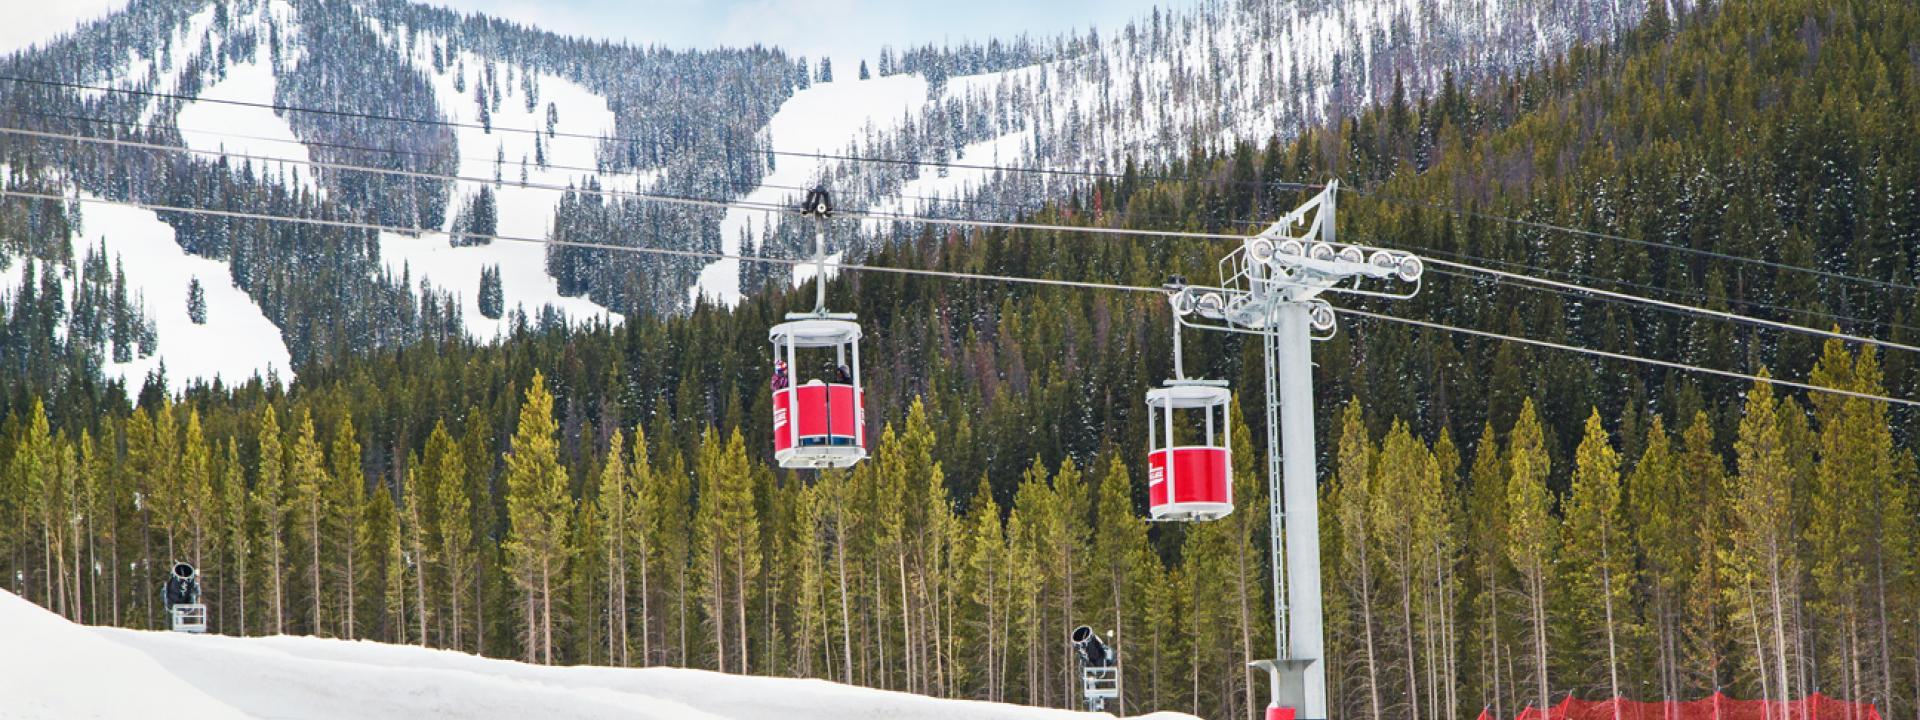 Cola-Coca Tubing Hill at Winter Park Resort